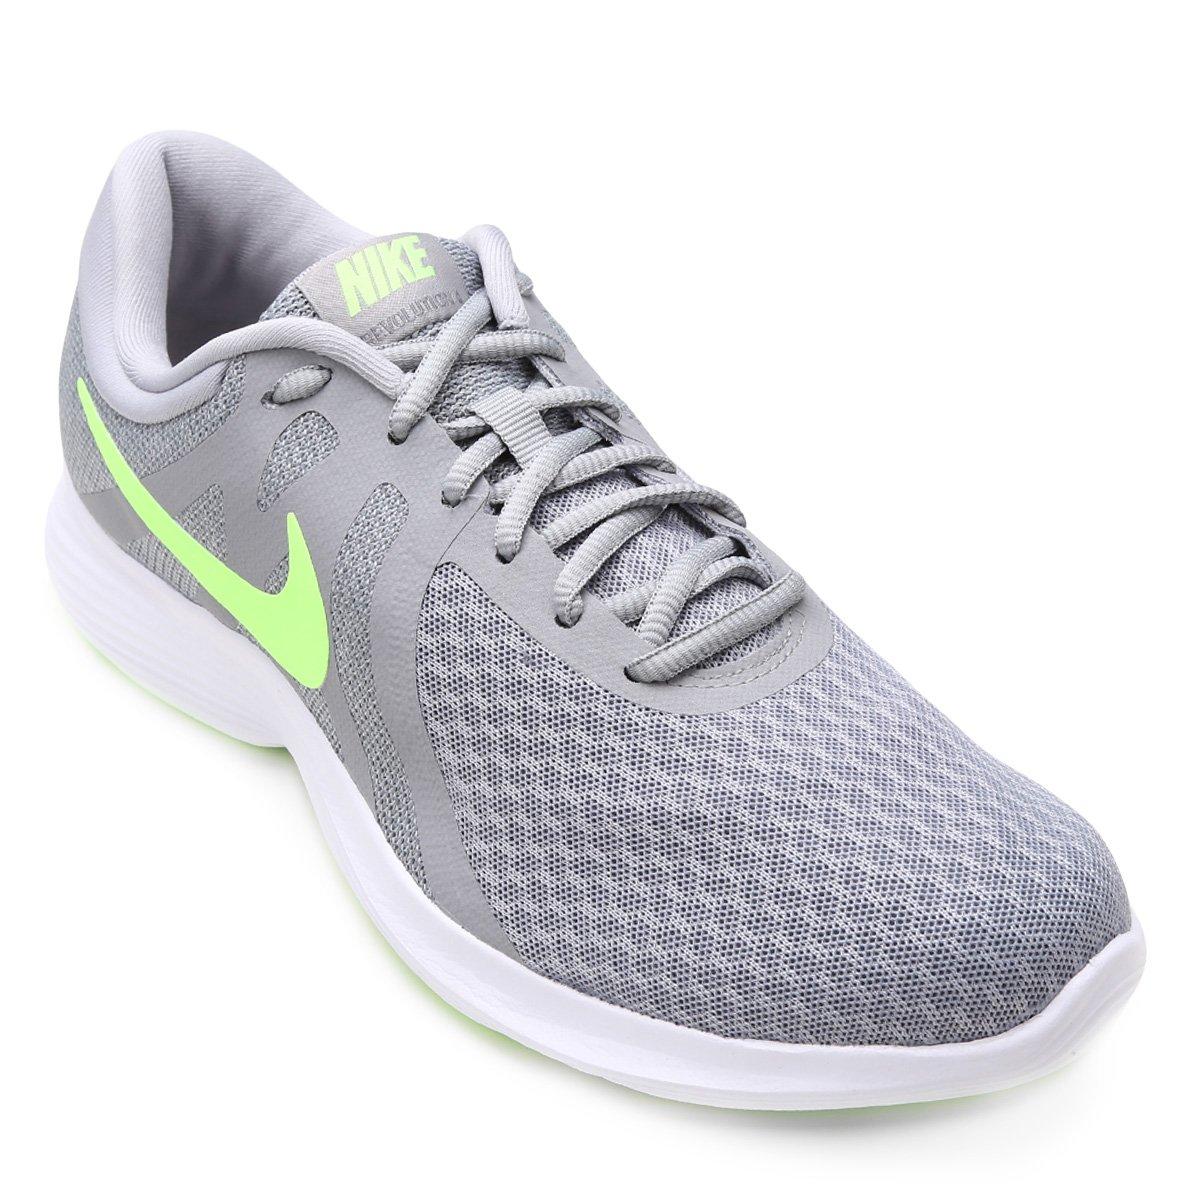 05f3465211 Tênis Nike Revolution 4 Masculino - Tam  43 - Shopping TudoAzul